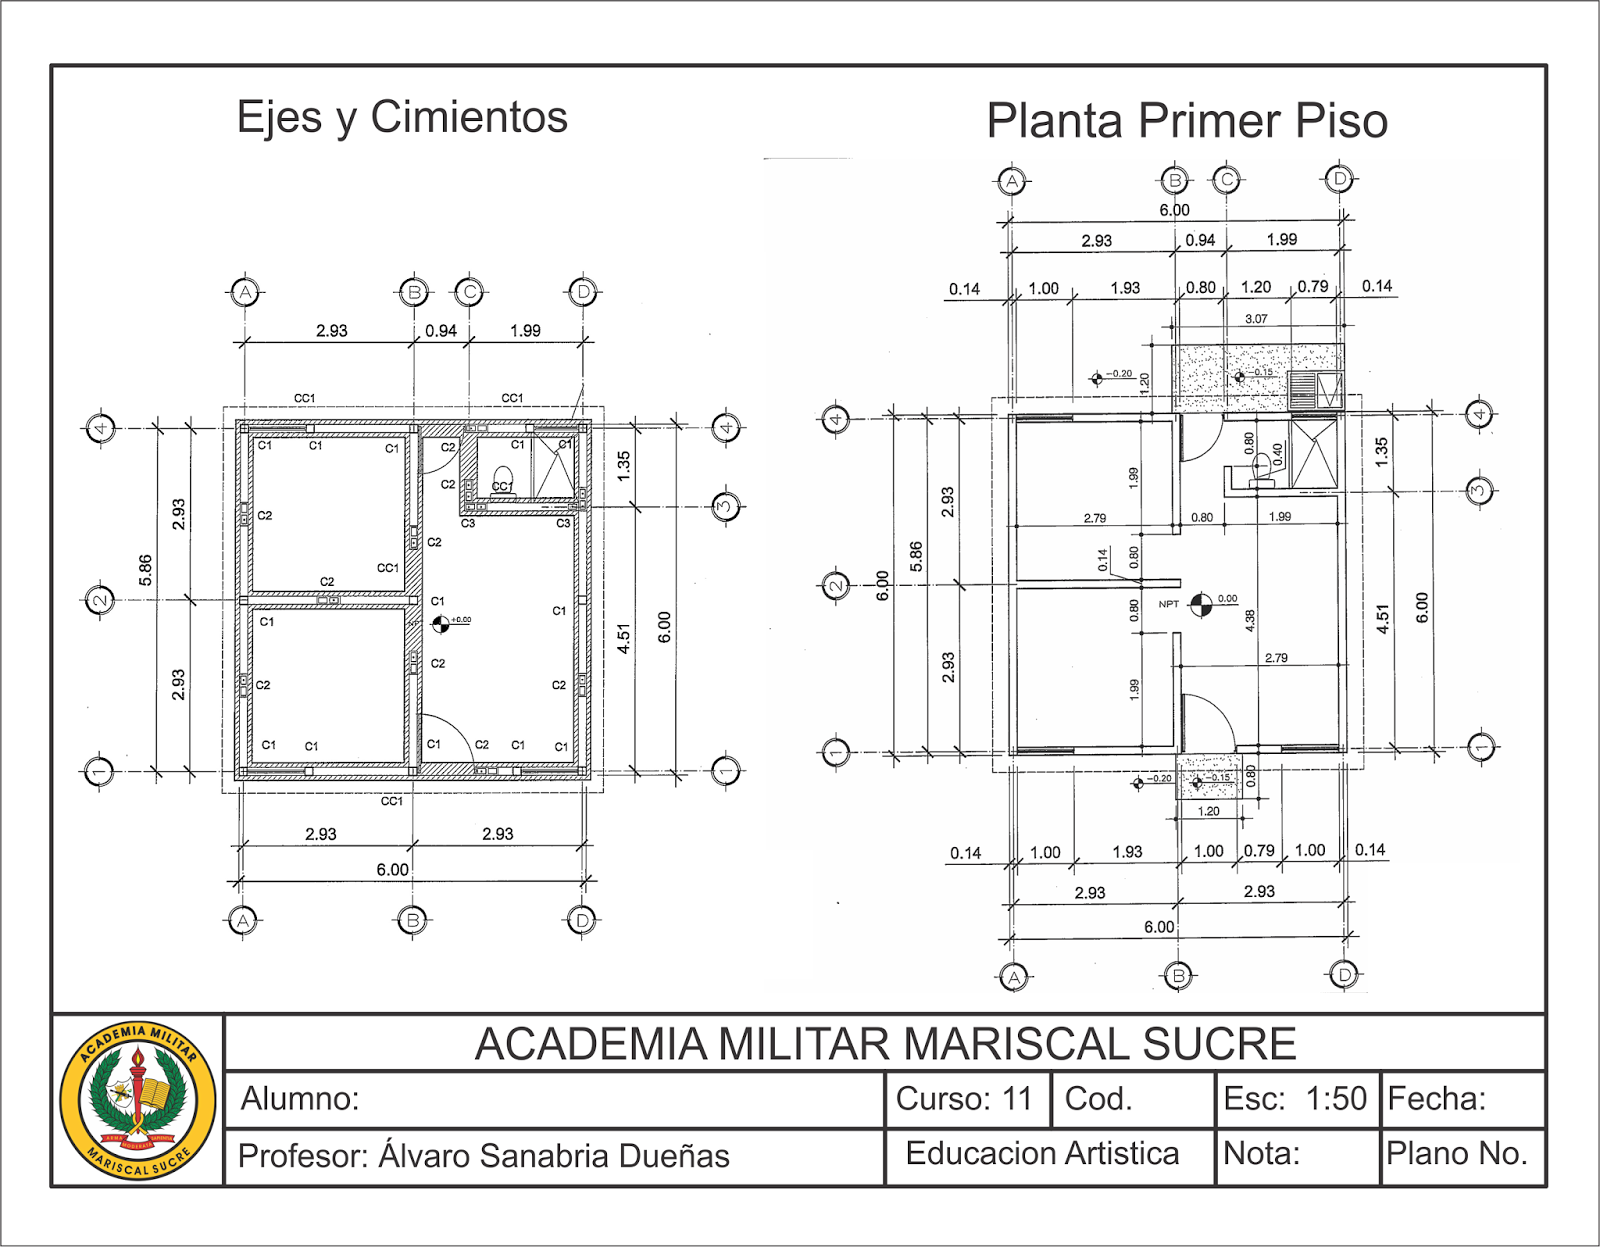 Arteamms for Elementos de un plano arquitectonico